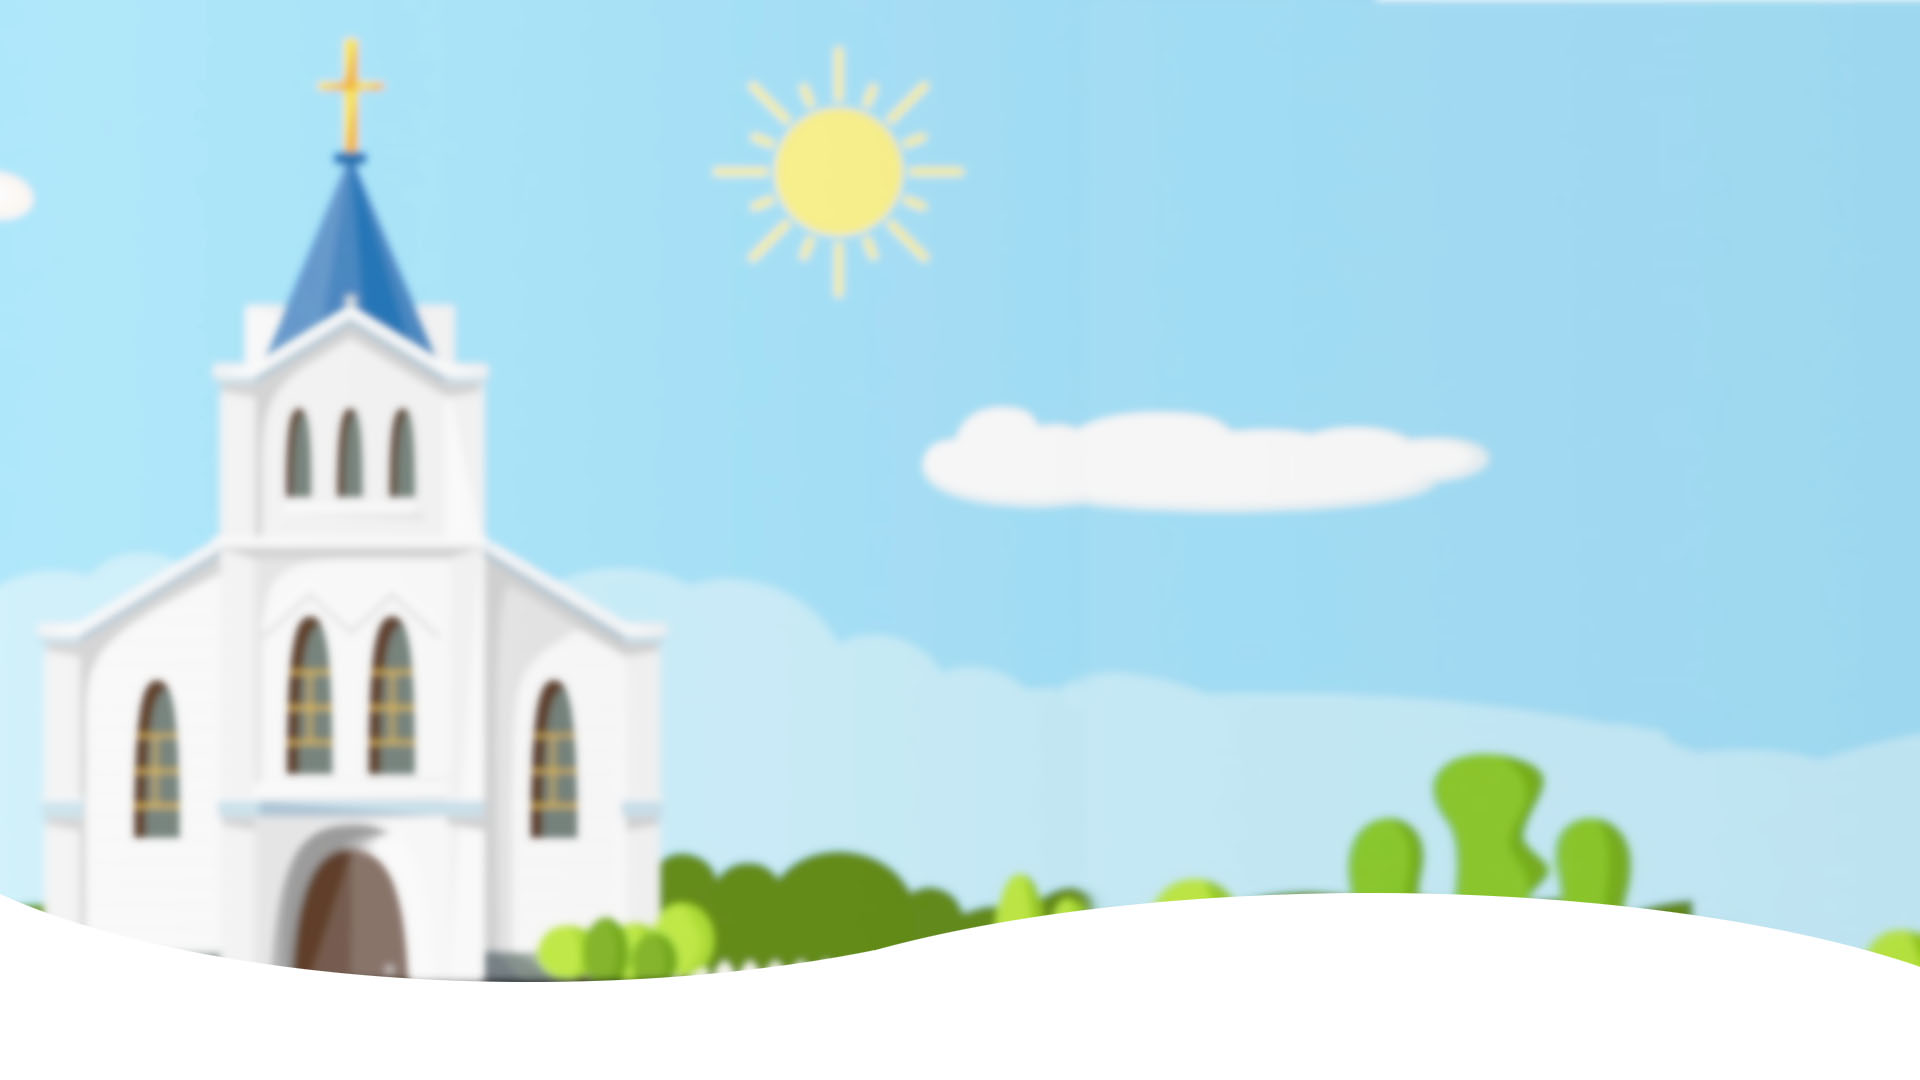 blurred church background